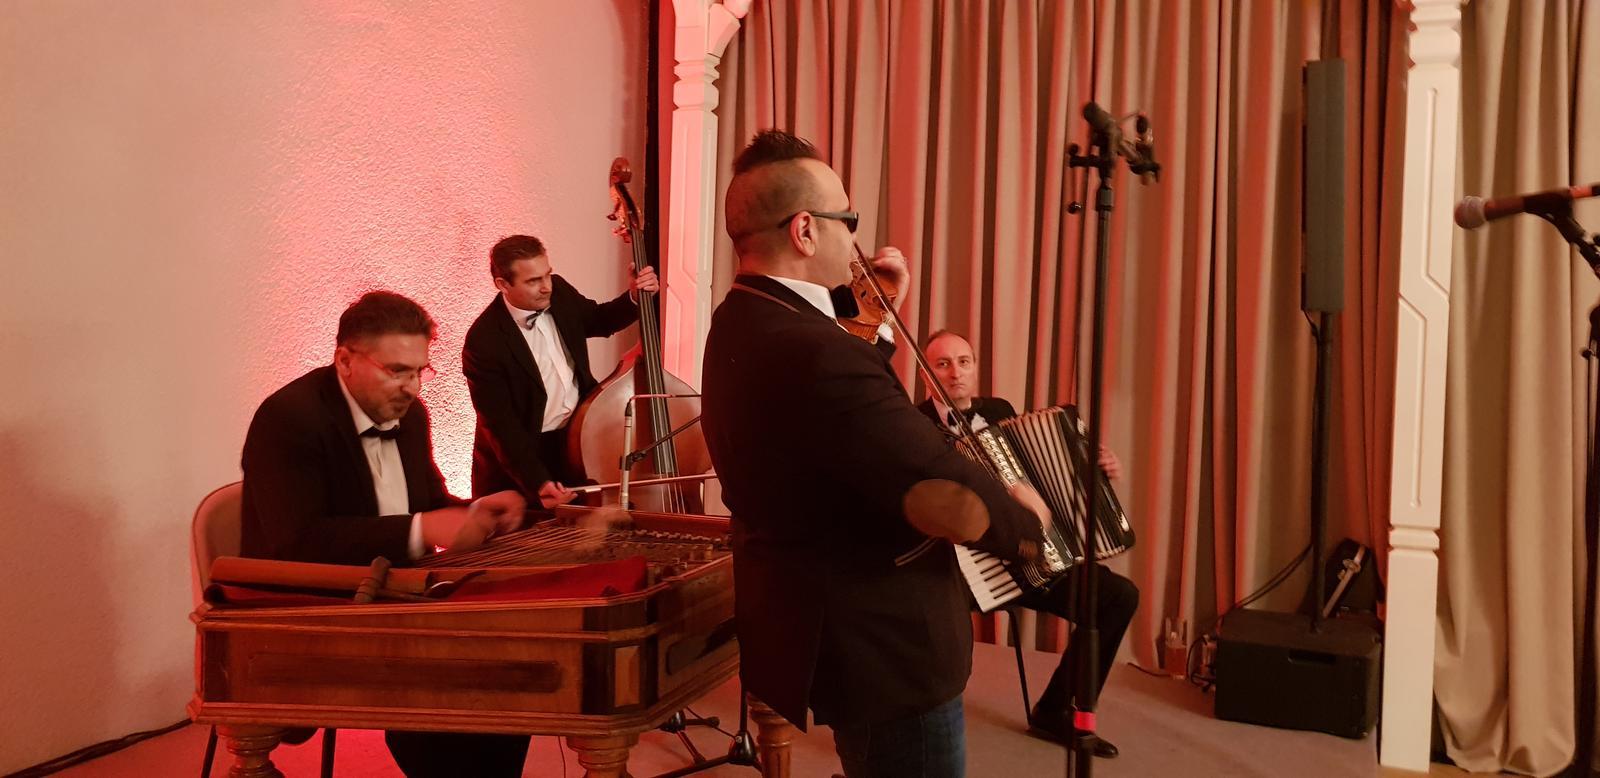 Cimbalovka Diamond Band - Obrázok č. 3